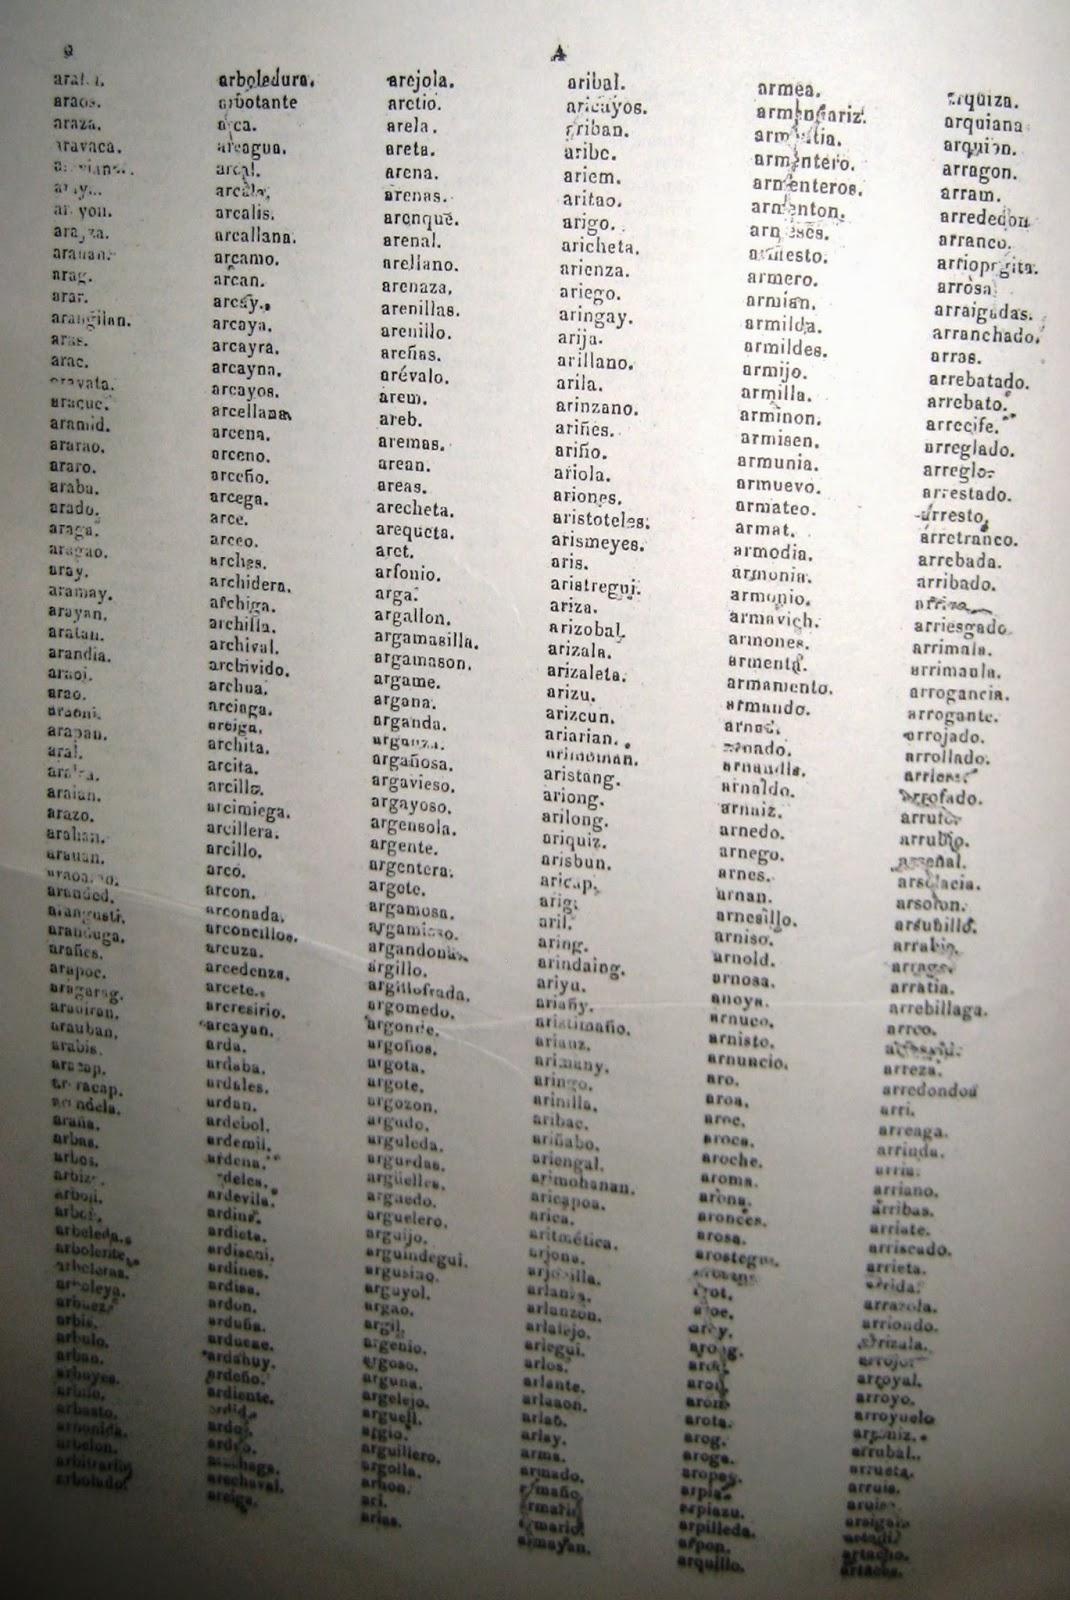 Filipino Genealogy Project: Genealogy Question #1: List of Surnames